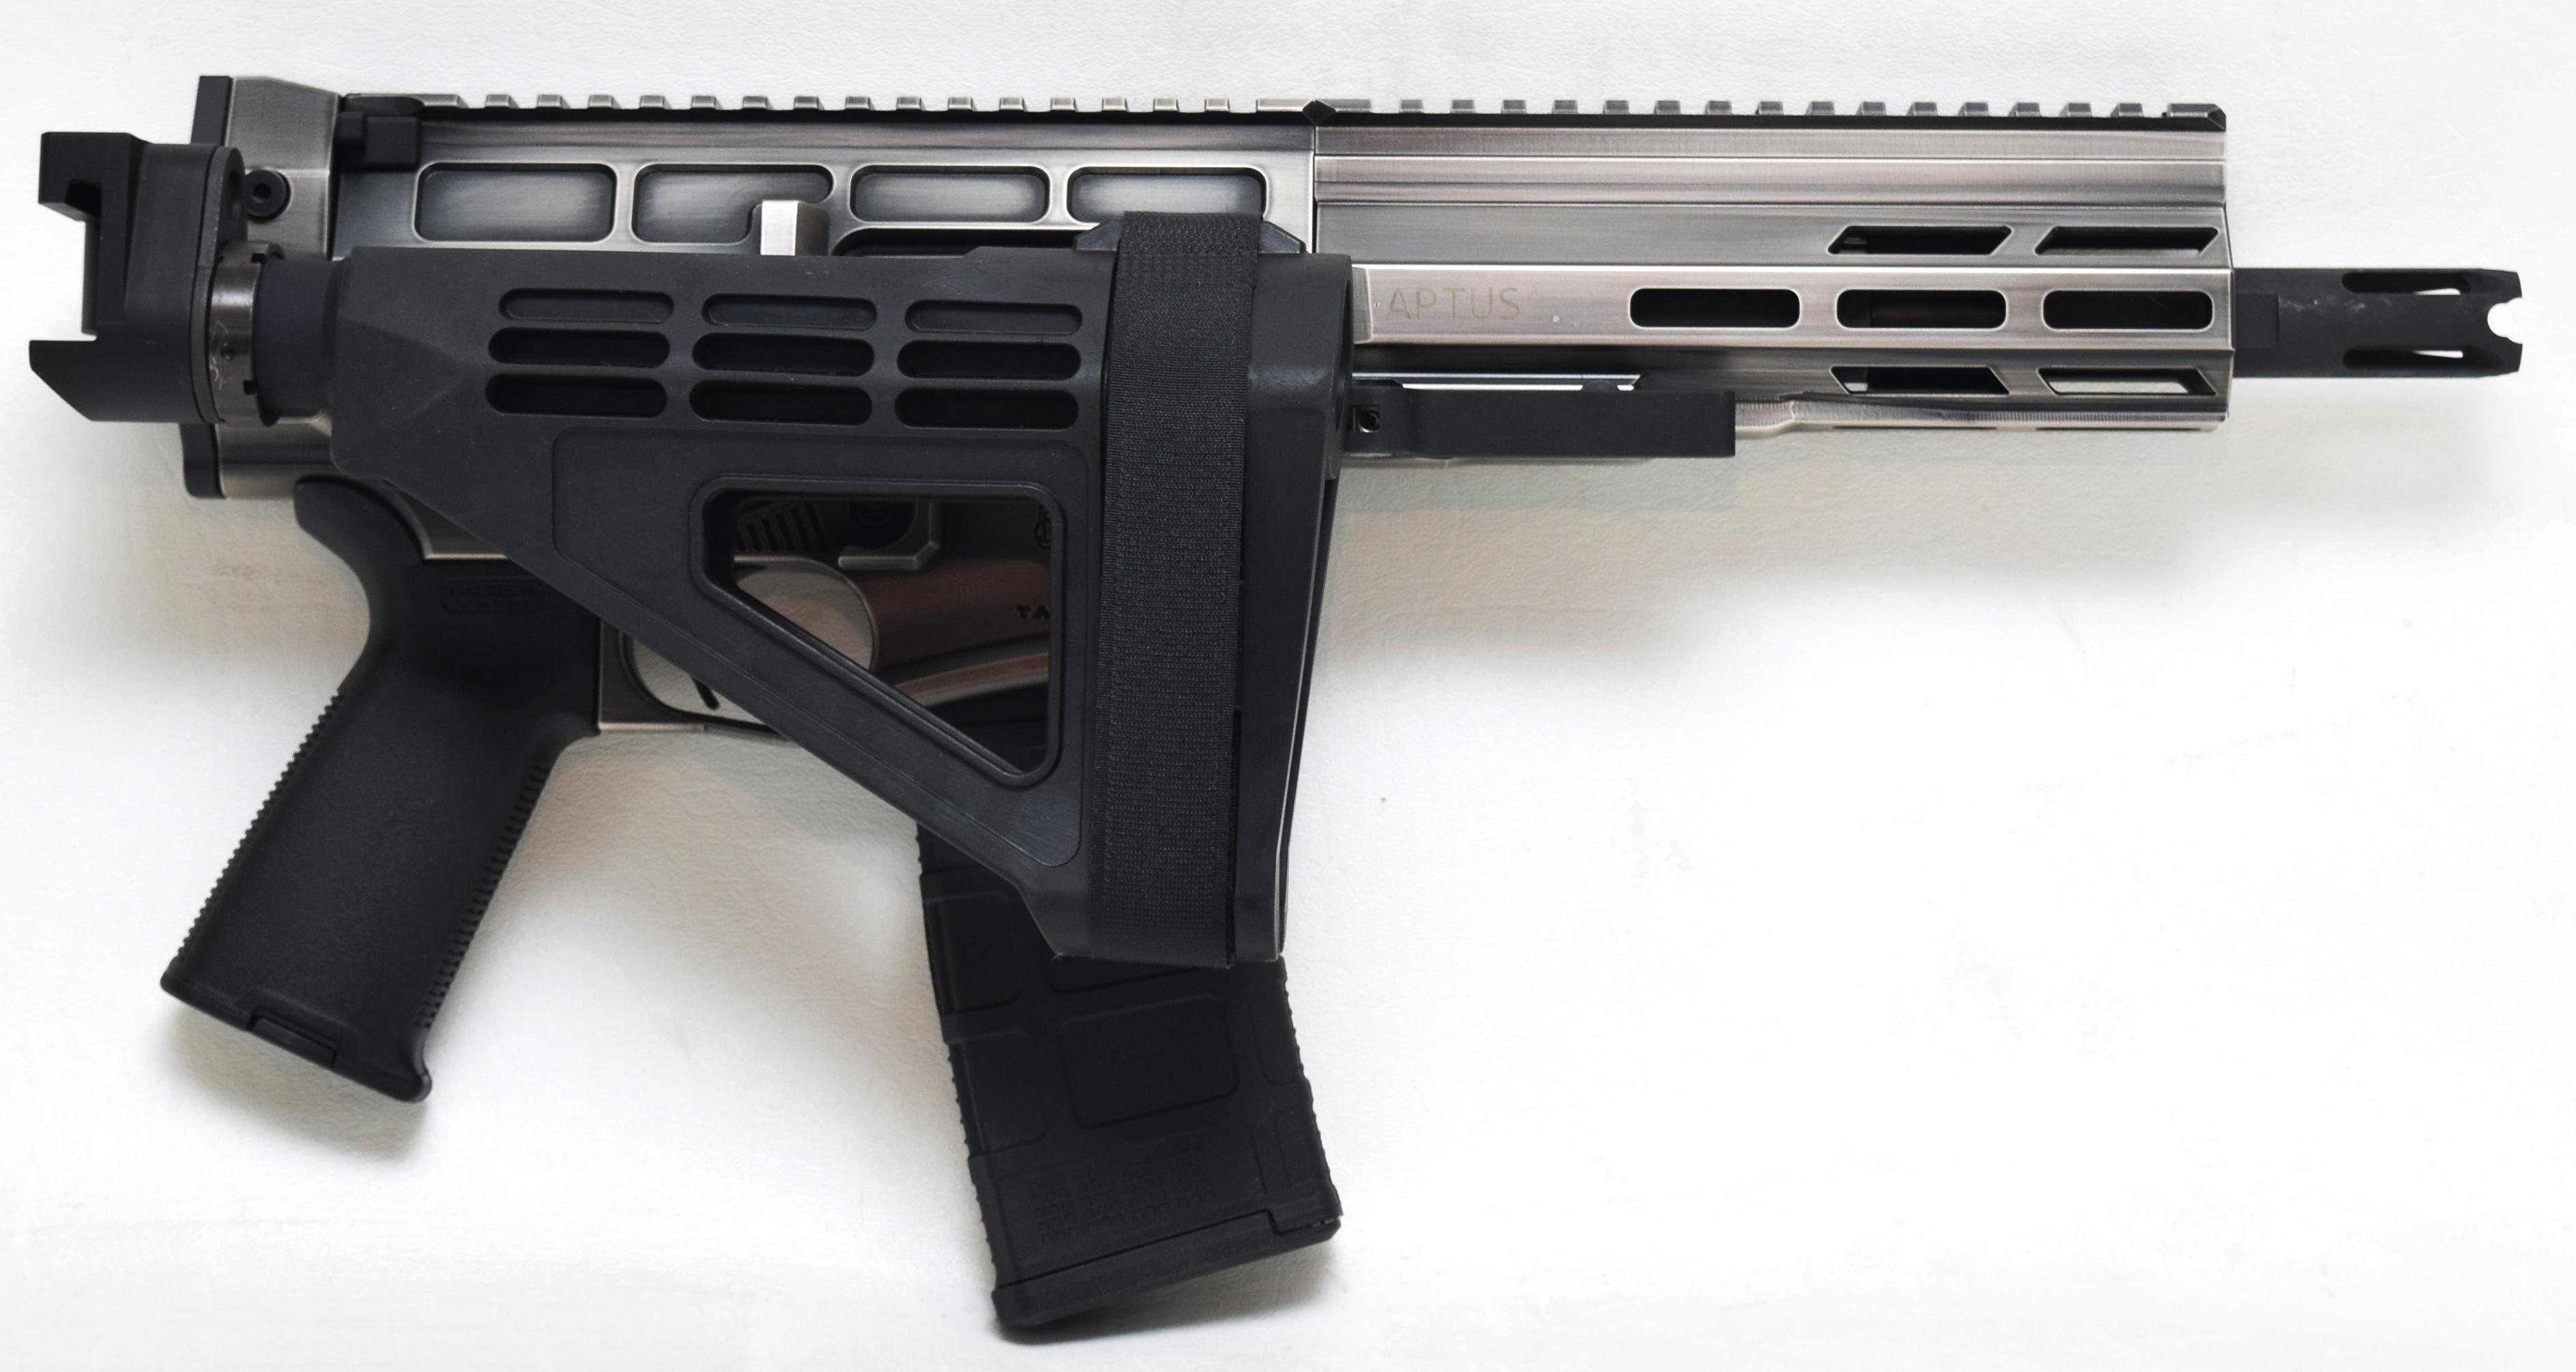 Aptus pistol folding